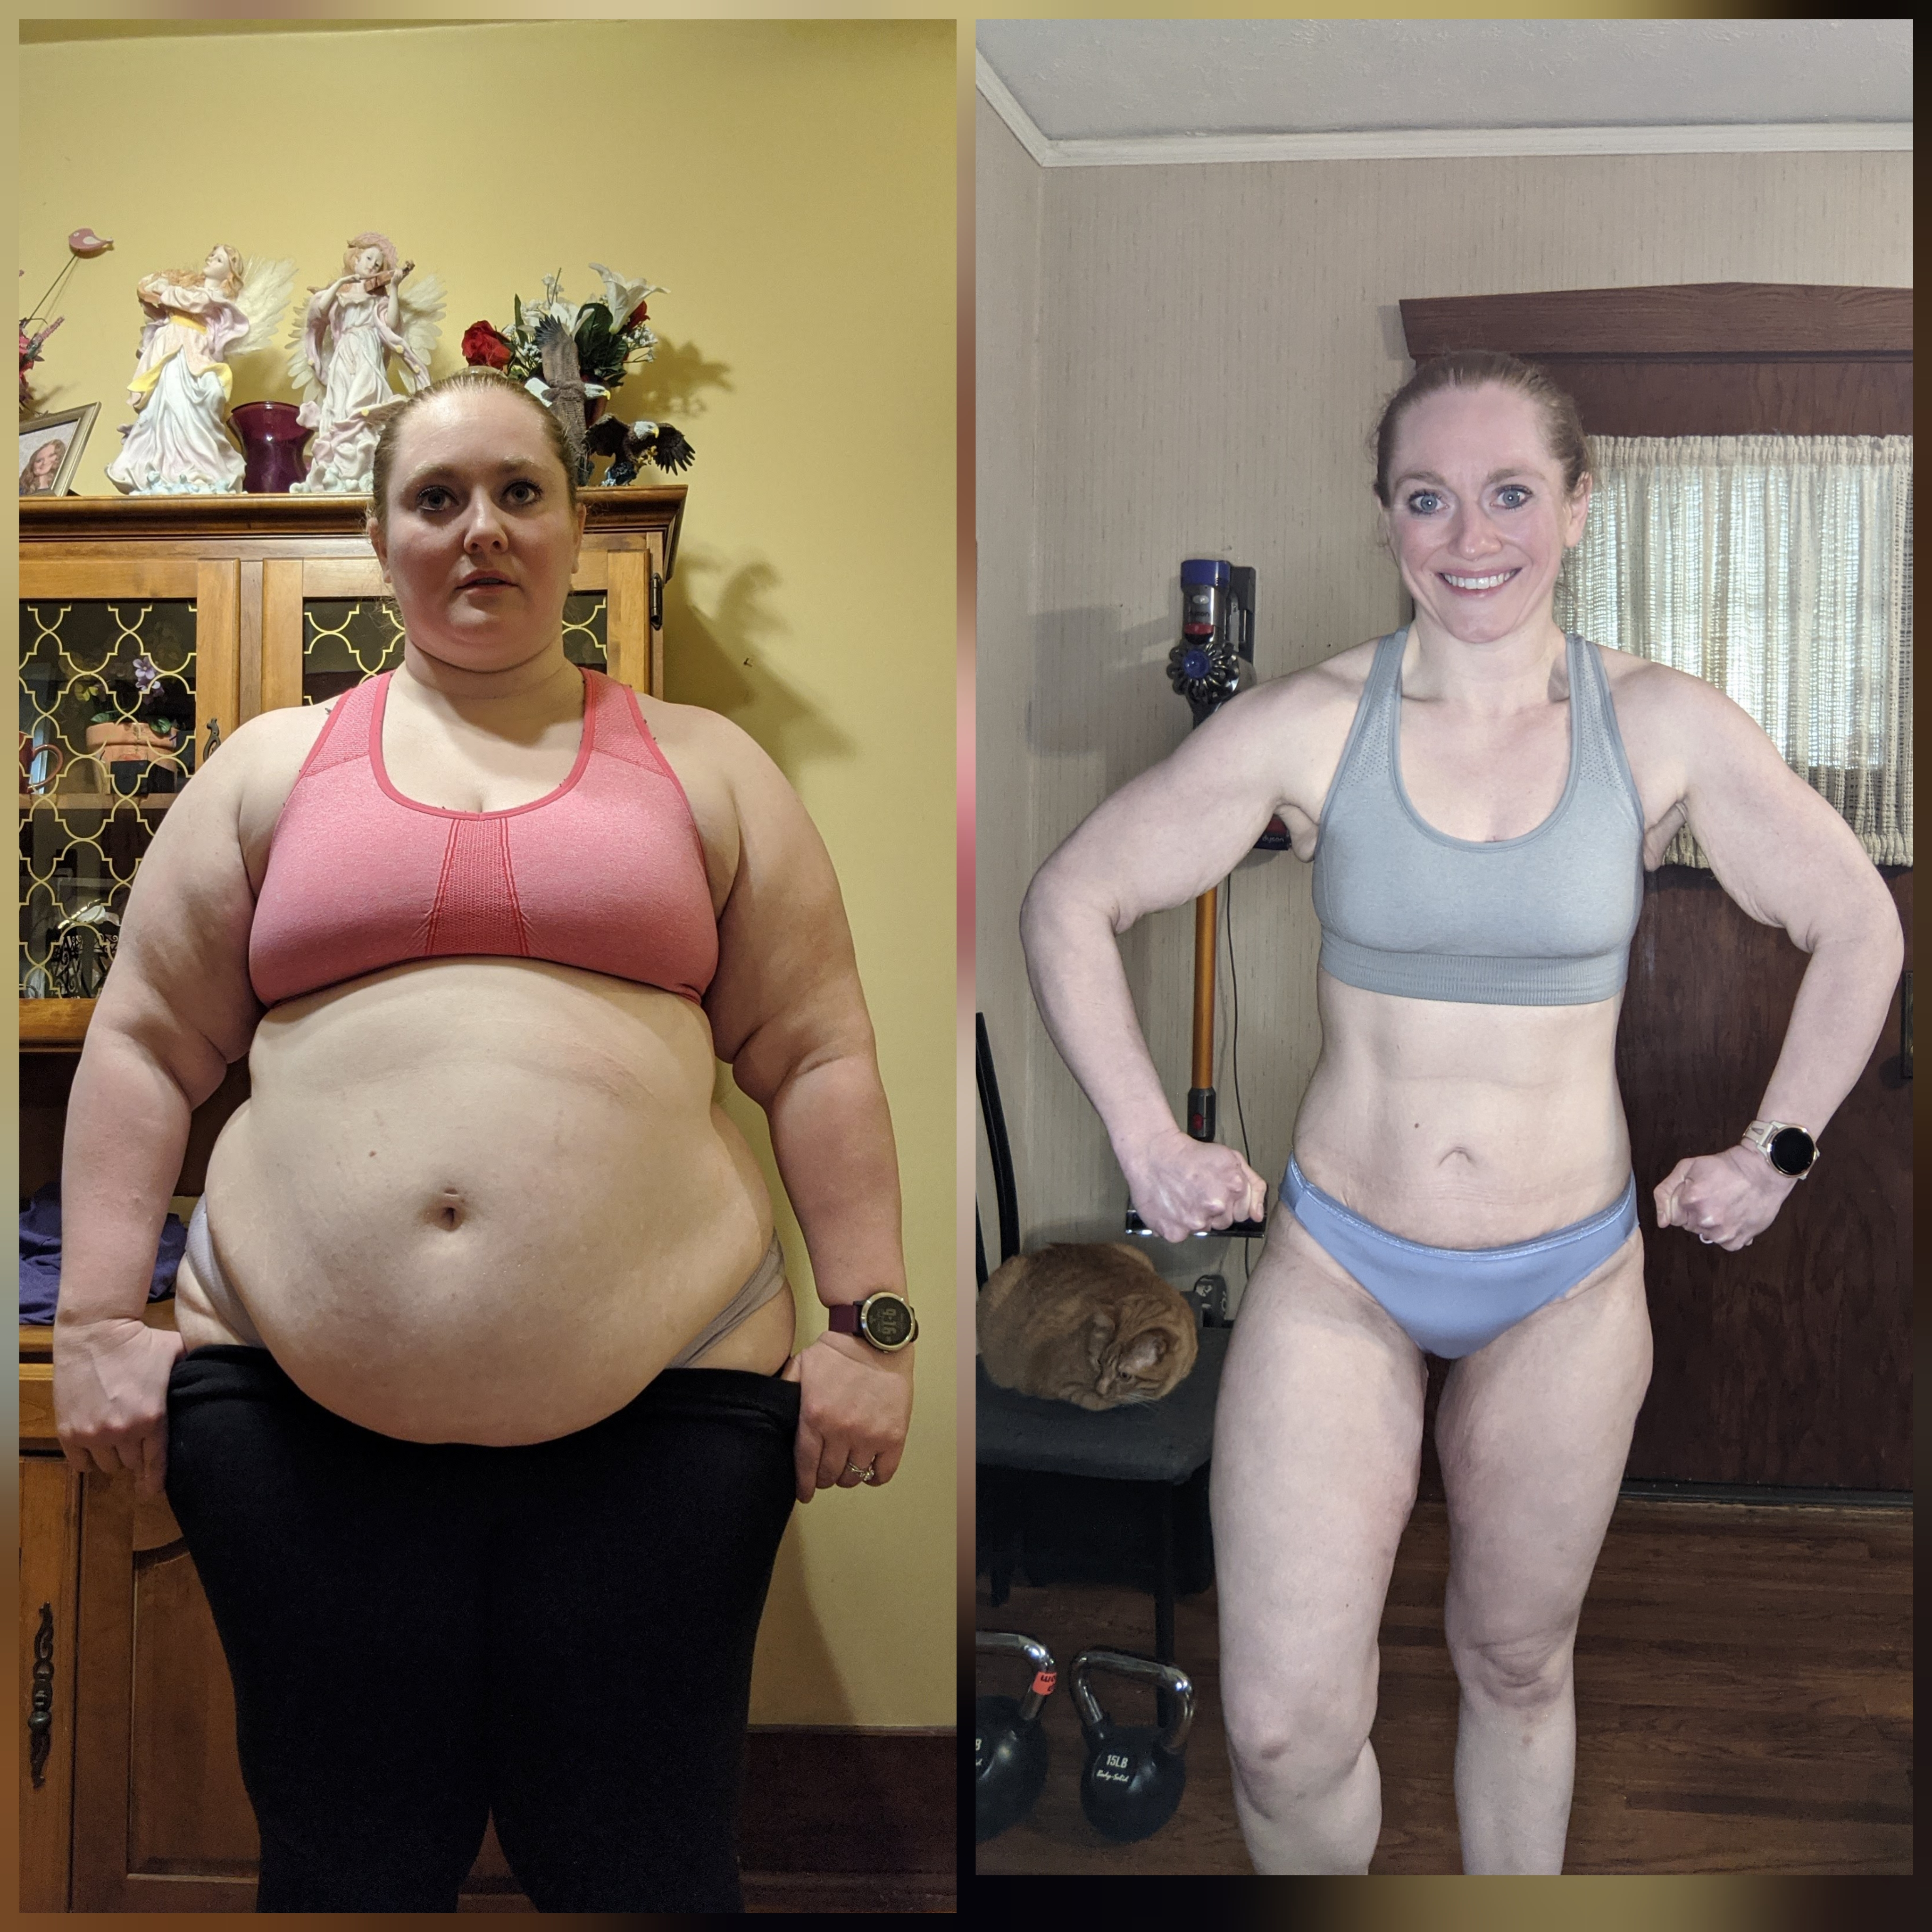 5 foot 4 Female Progress Pics of 140 lbs Weight Loss 284 lbs to 144 lbs